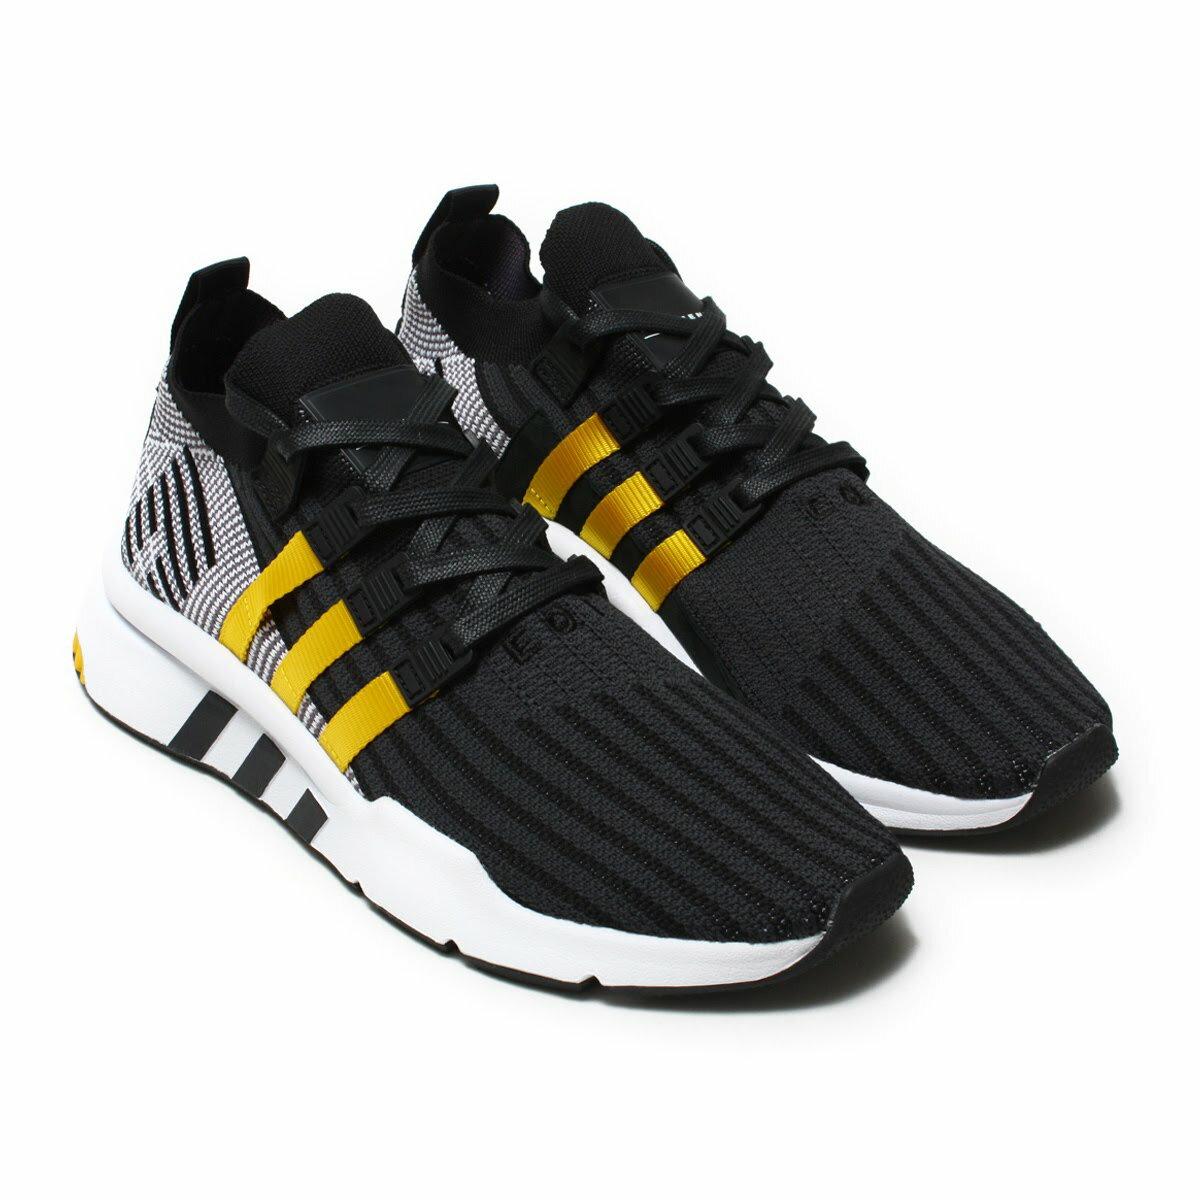 adidas Originals EQT SUPPORT MID ADV PK(アディダス オリジナルス イーキューティー サポート ミッド ADV PK)Core Black/Eqt Yellow/Running White【メンズ レディース スニーカー】18SS-I